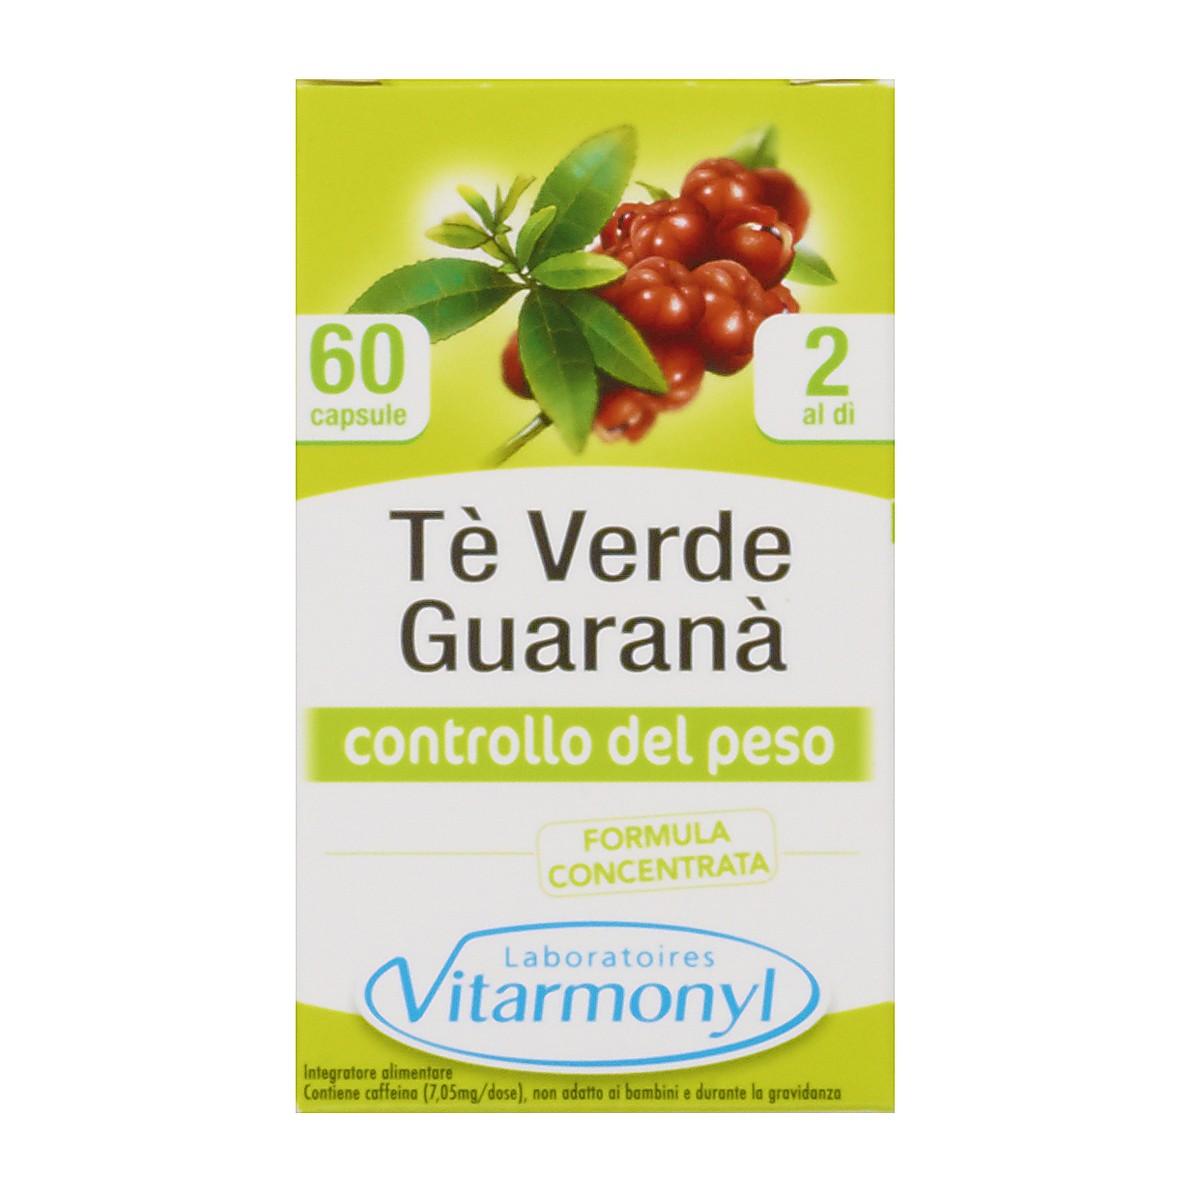 Integratore Tè Verde e Guaranà